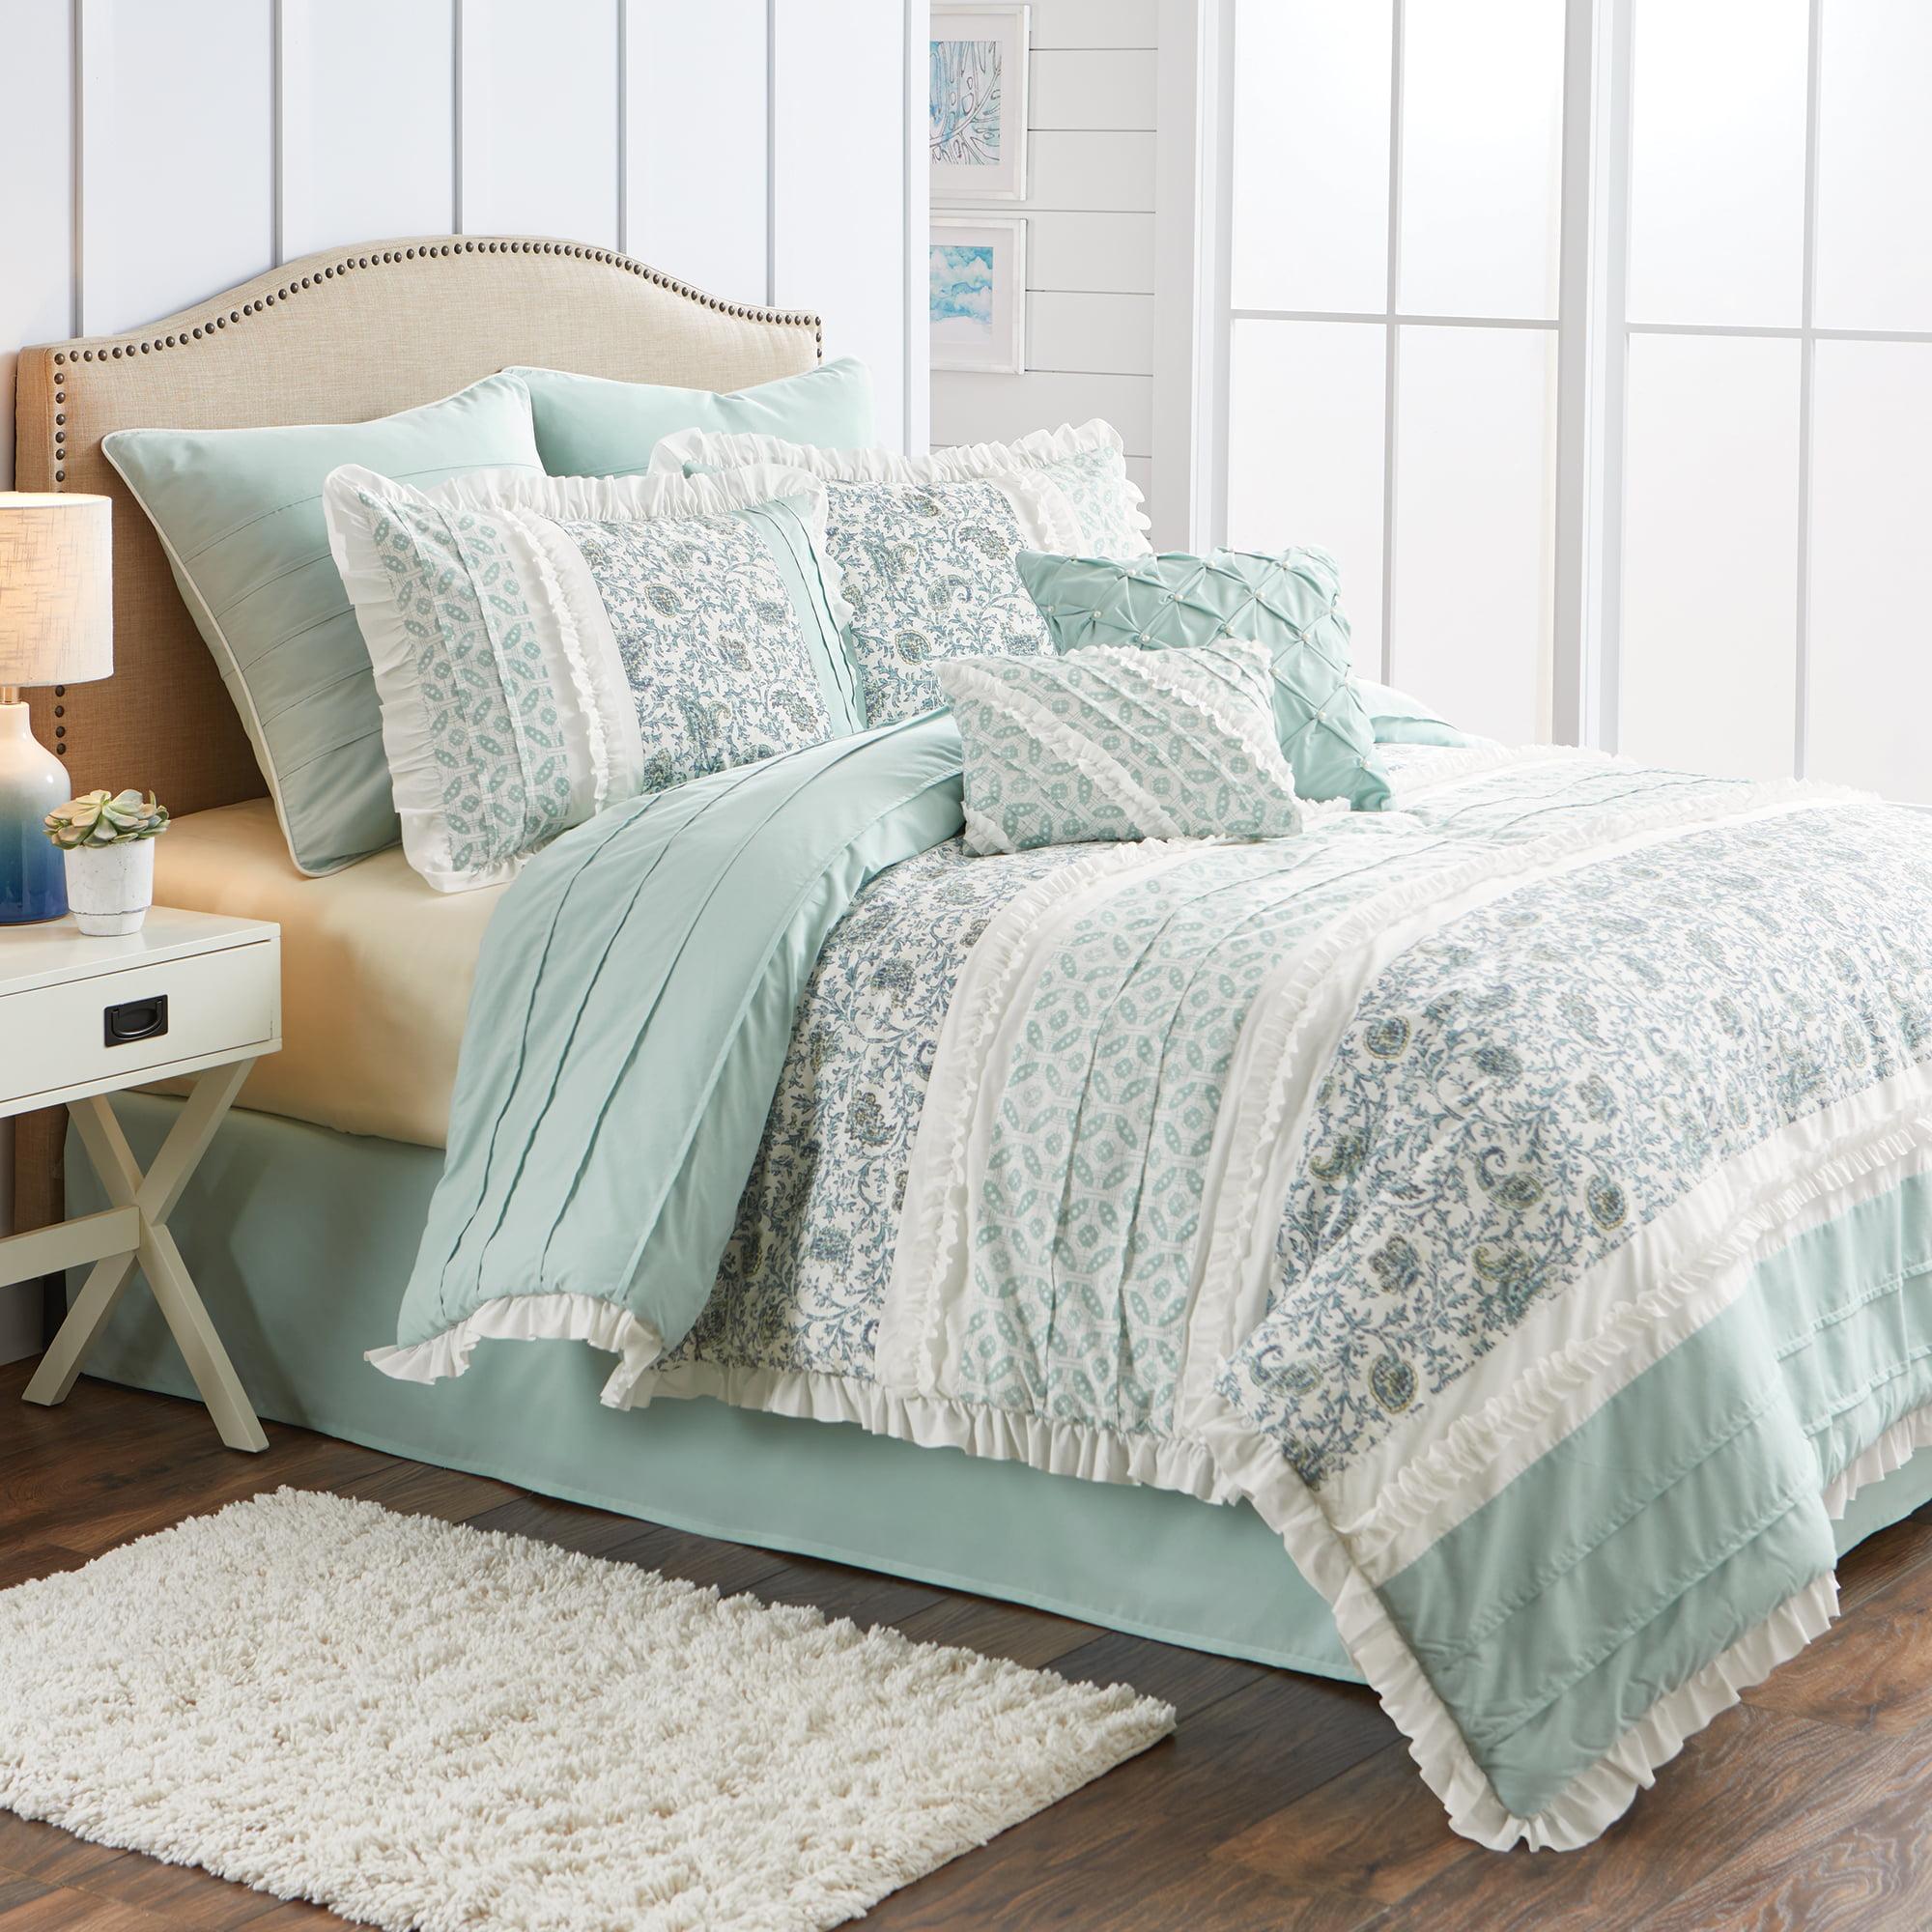 Better Homes & Gardens Full or Queen Cottage Floral Comforter Set